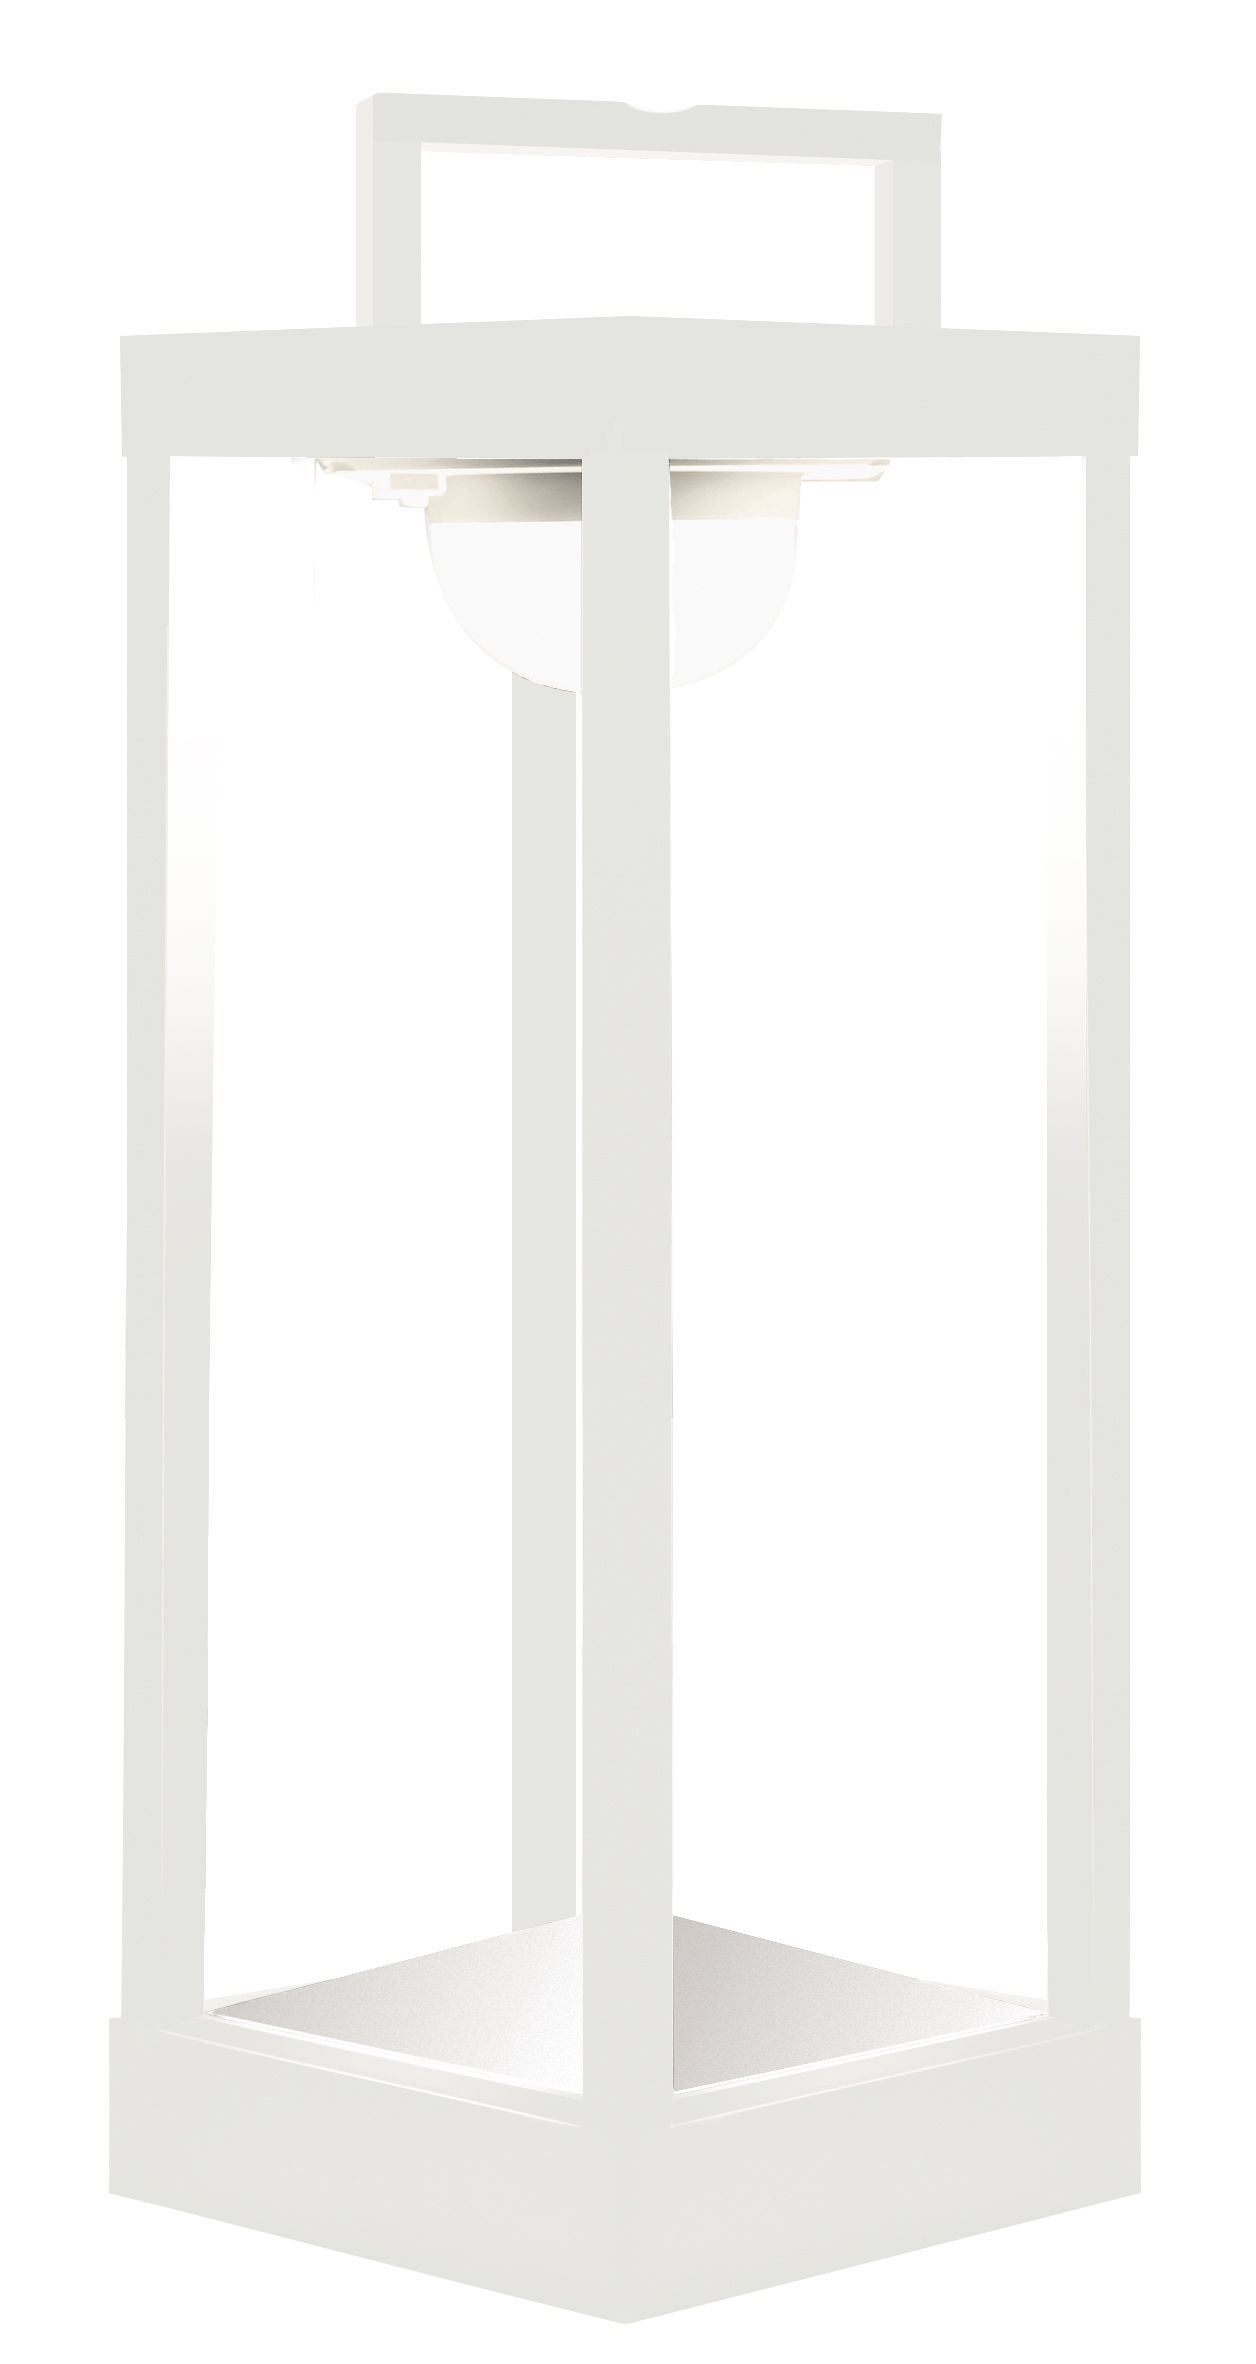 Leuchten - Tischleuchten - La Lampe Parc L Solarlampe LED / kabellos - H 50 cm - Maiori - Weiß - Aluminium, Glas